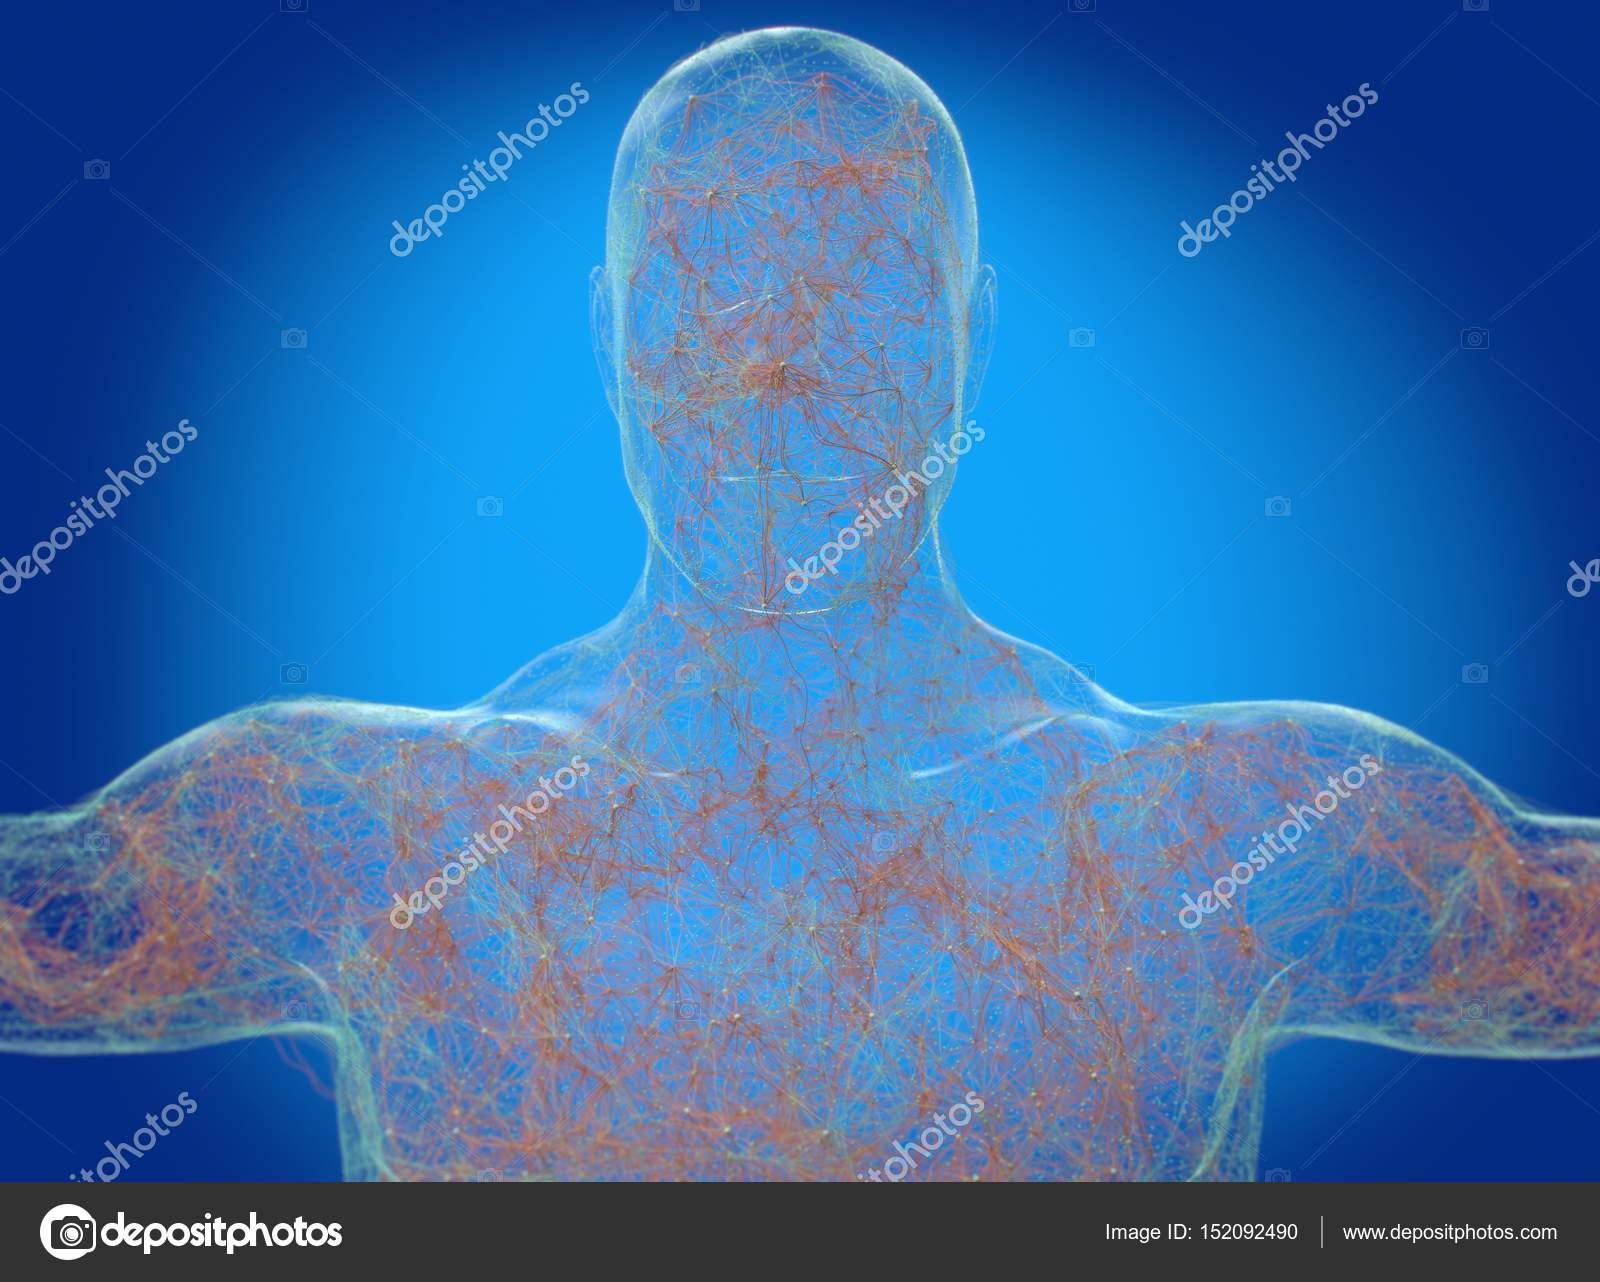 Menschlichen Körpers Neurologie, Nervensystem — Stockfoto ...